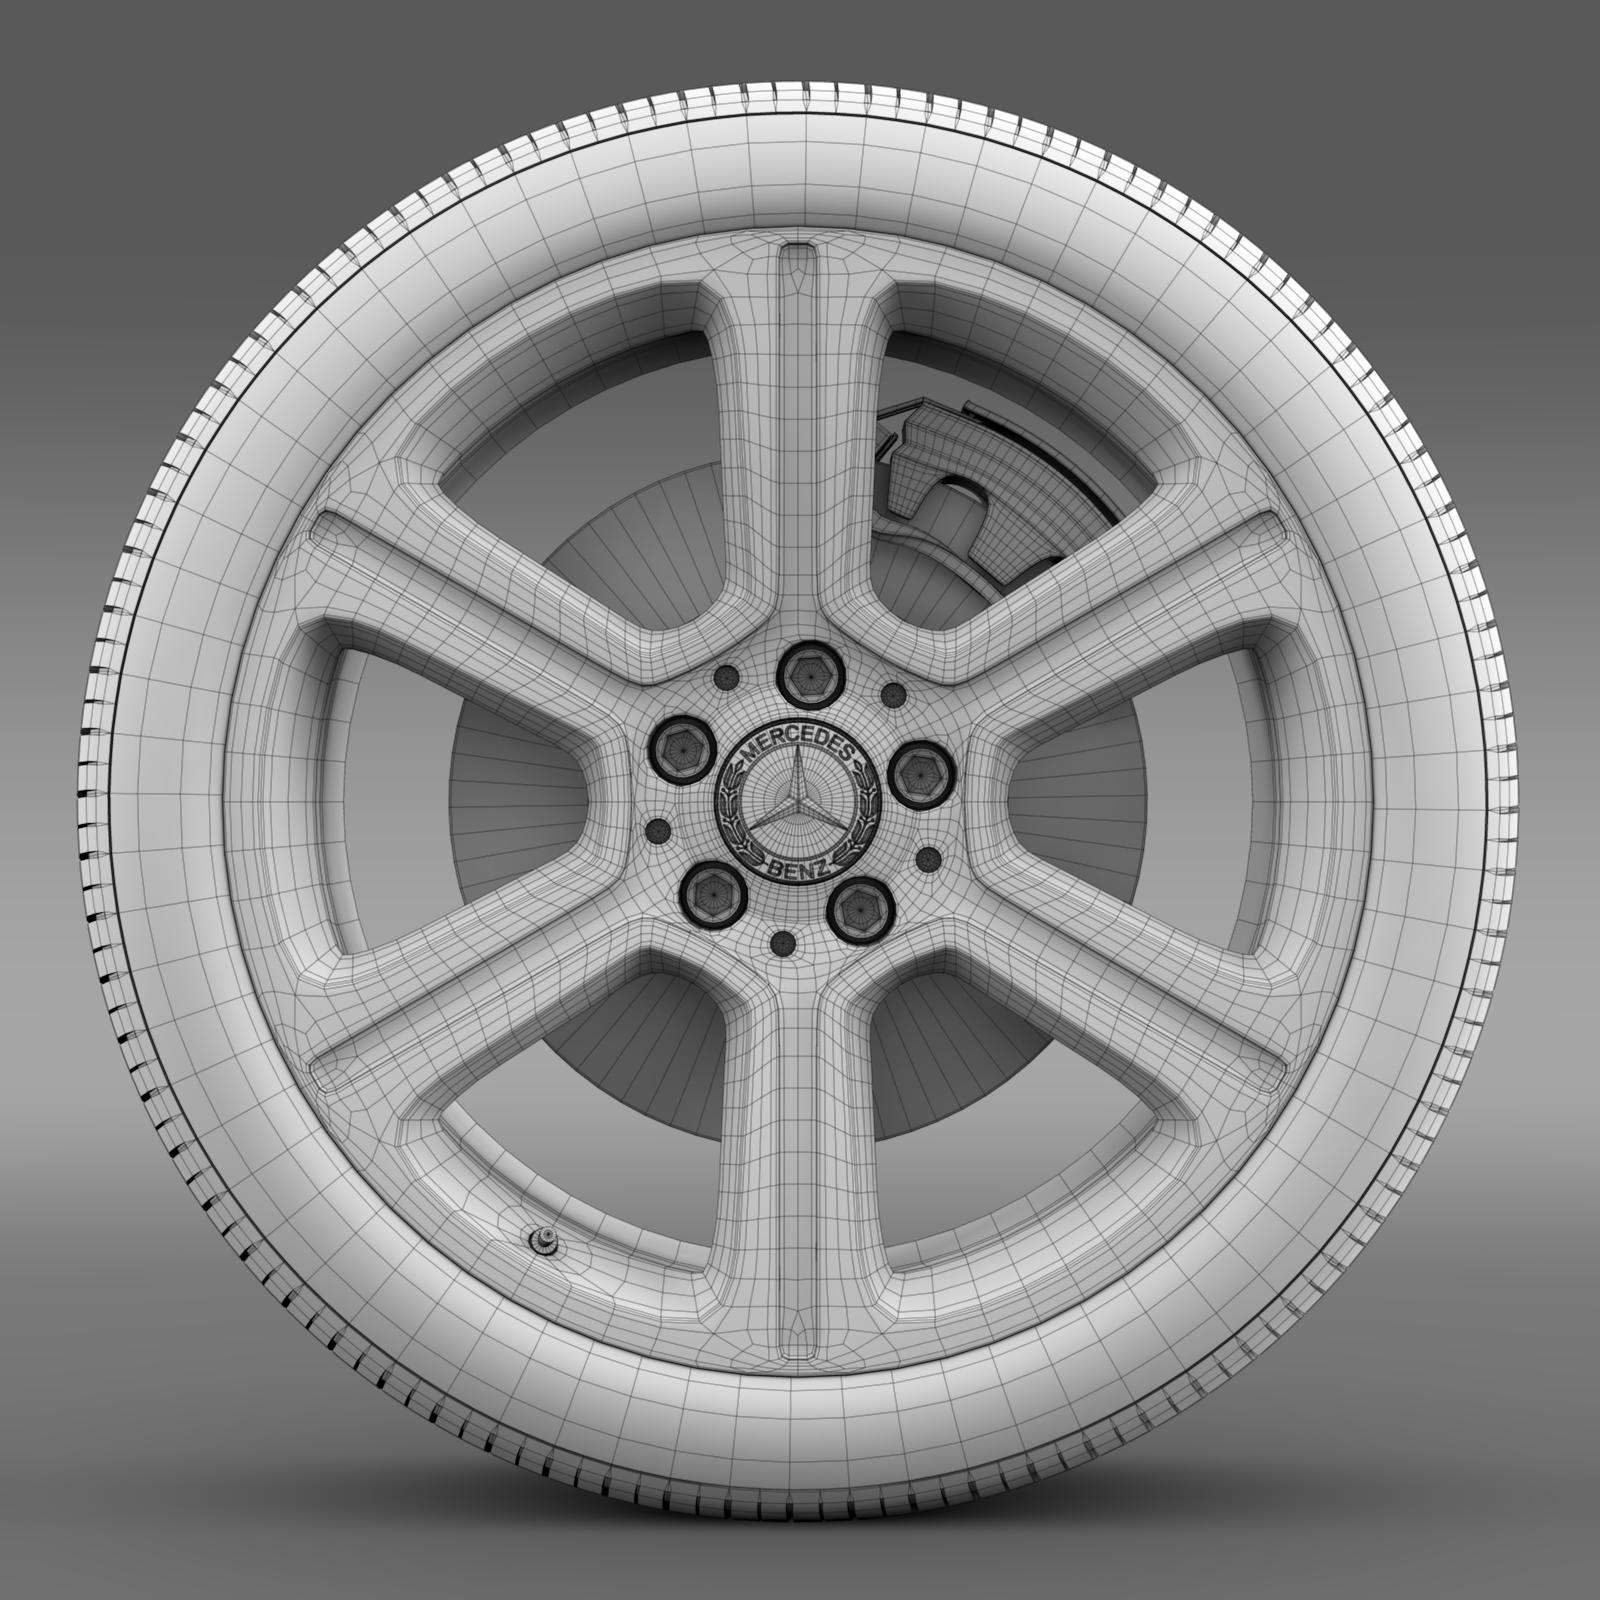 mercedes benz c 300 exclusive line wheel 3d model 3ds max fbx c4d lwo ma mb hrc xsi obj 210779